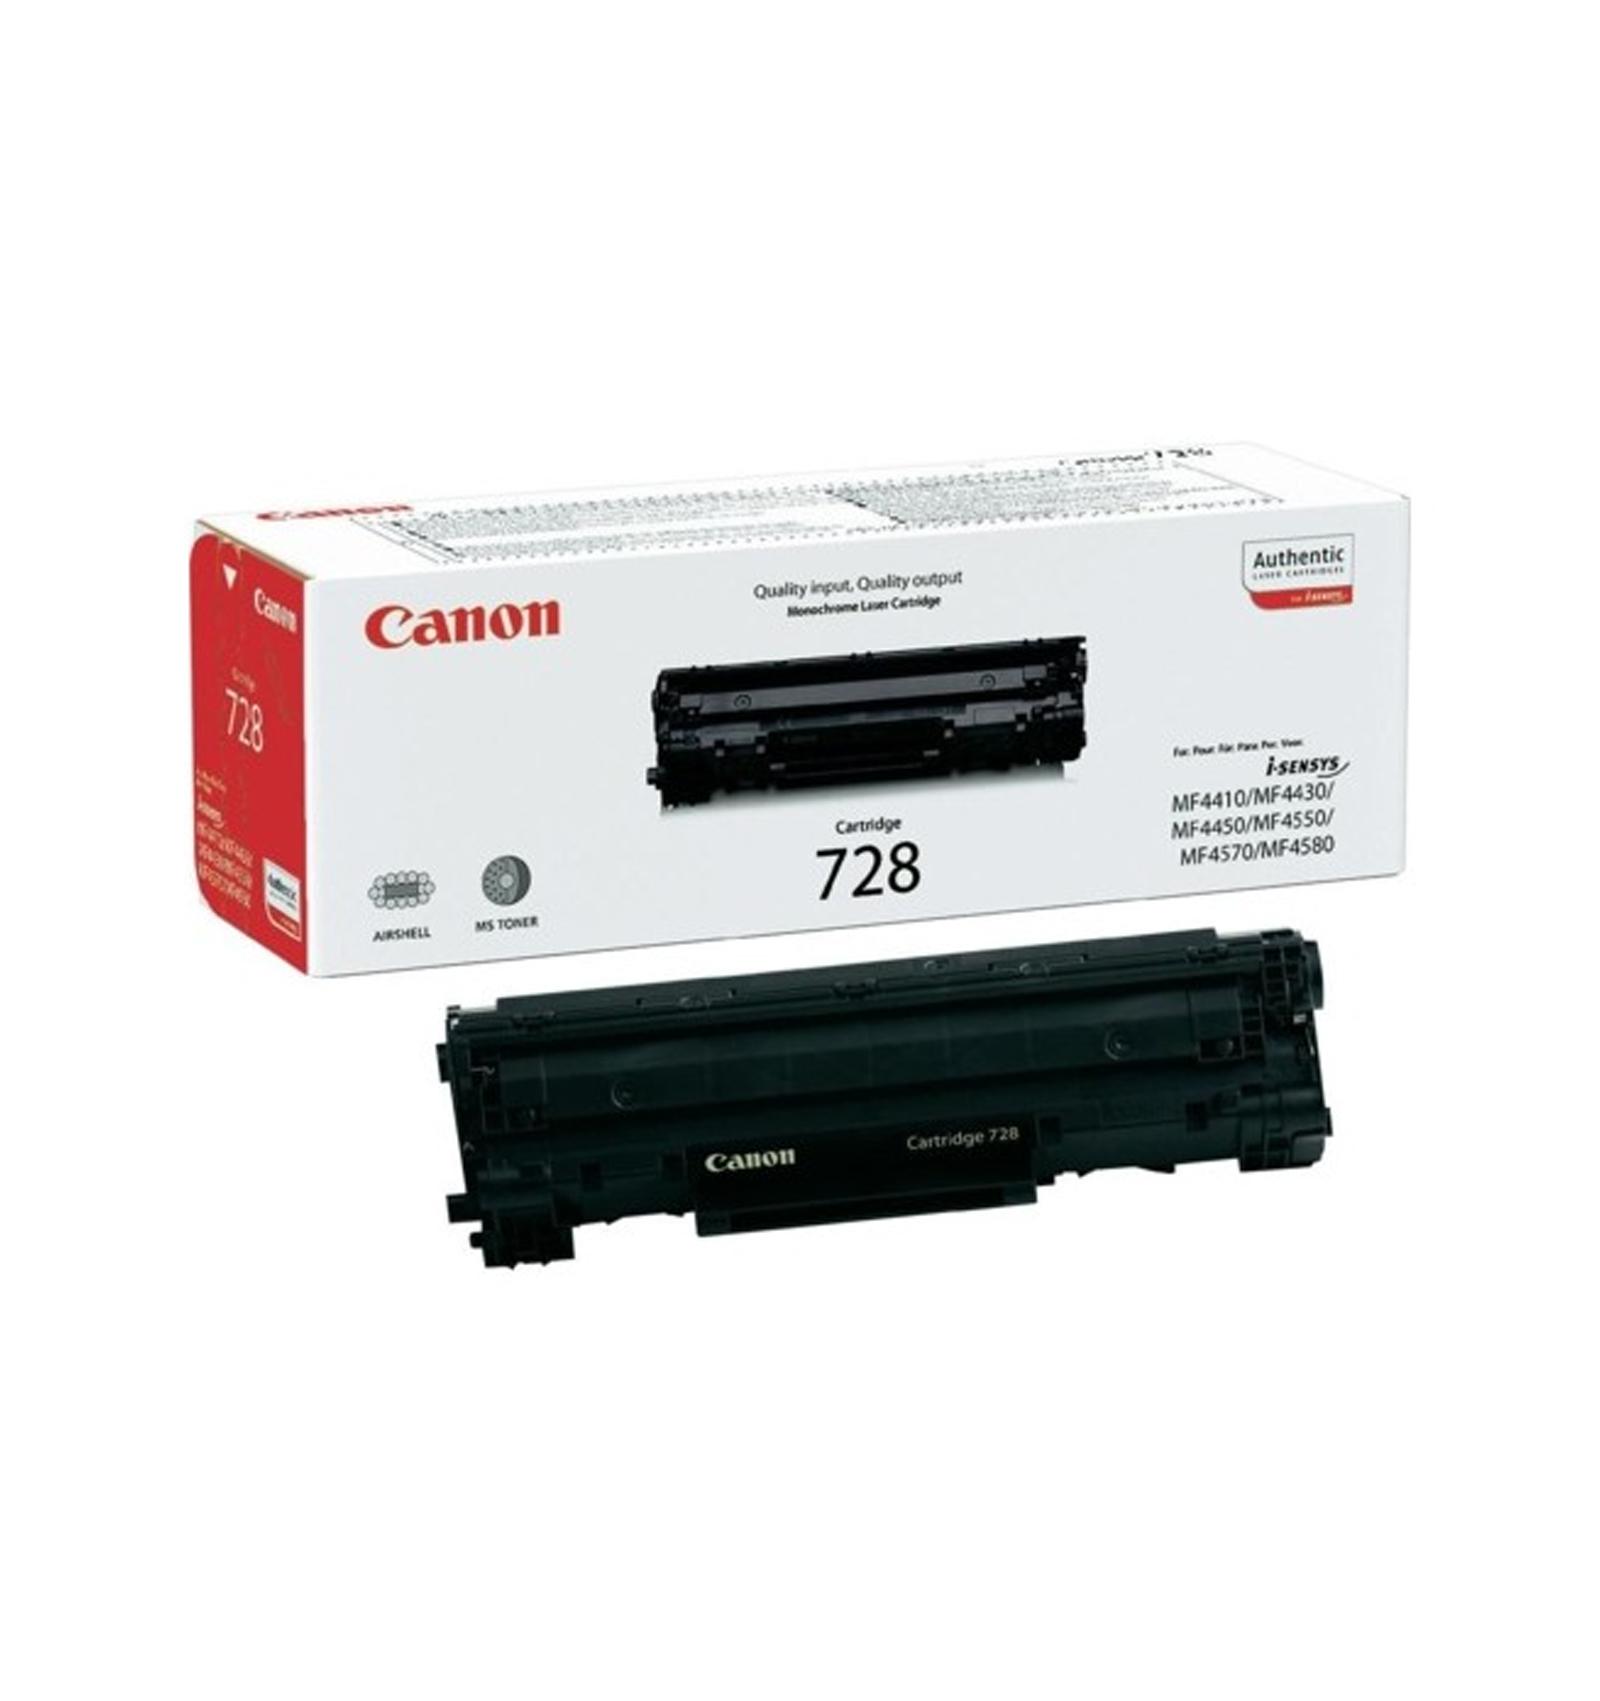 Canon 728 для MF4410/MF4430/MF4450/MF4550/MF4570/MF4580